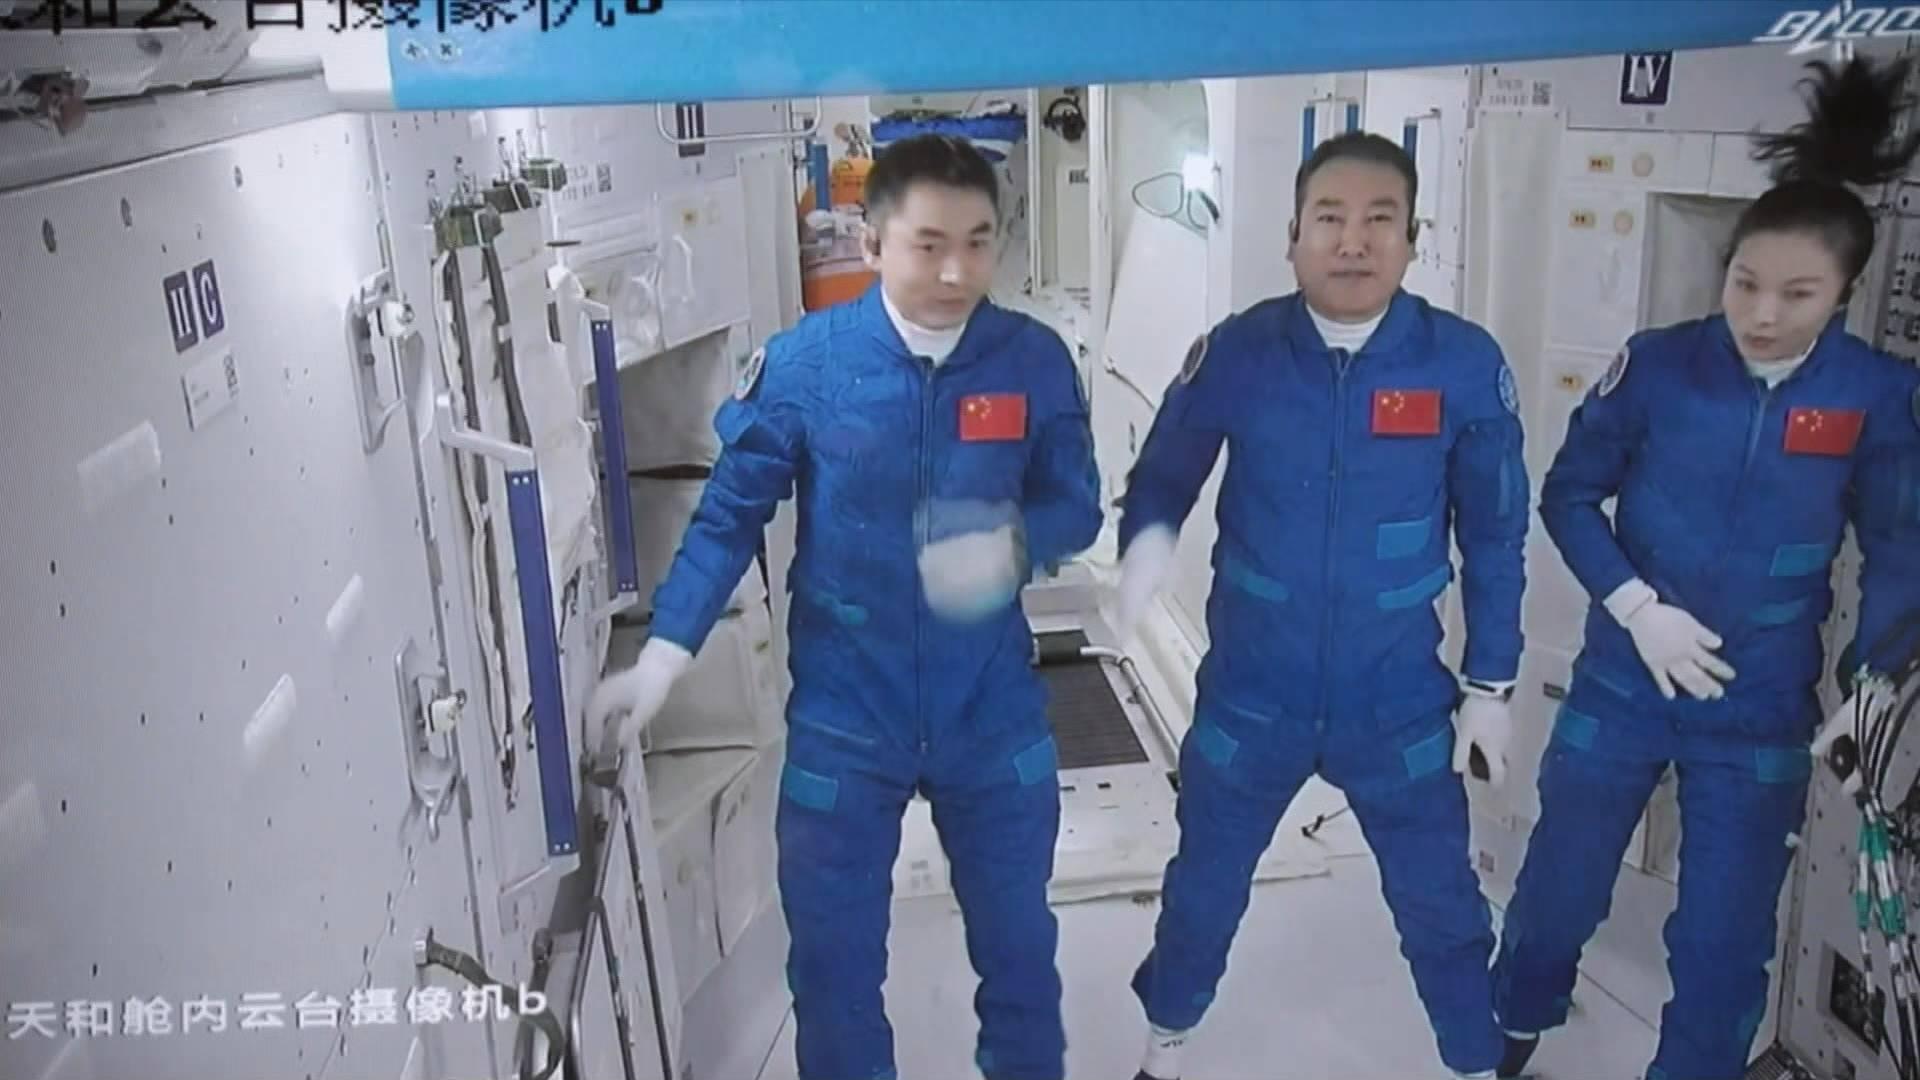 GLOBALink | Shenzhou-13 astronauts enter space station core module